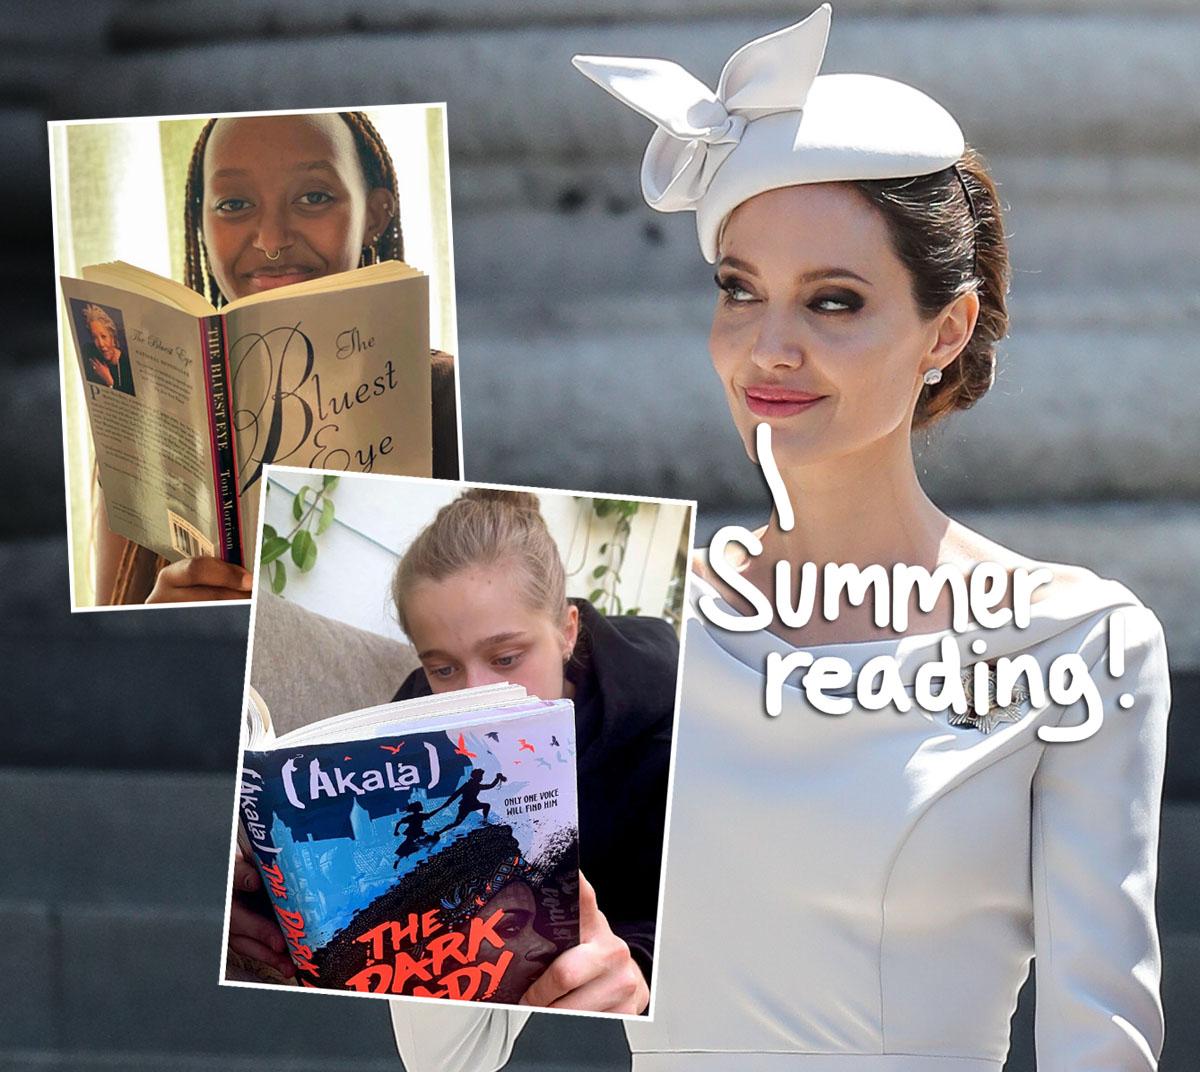 Angelina Jolie Shares Super Rare Photos Of Teens Zahara & Shiloh On Instagram